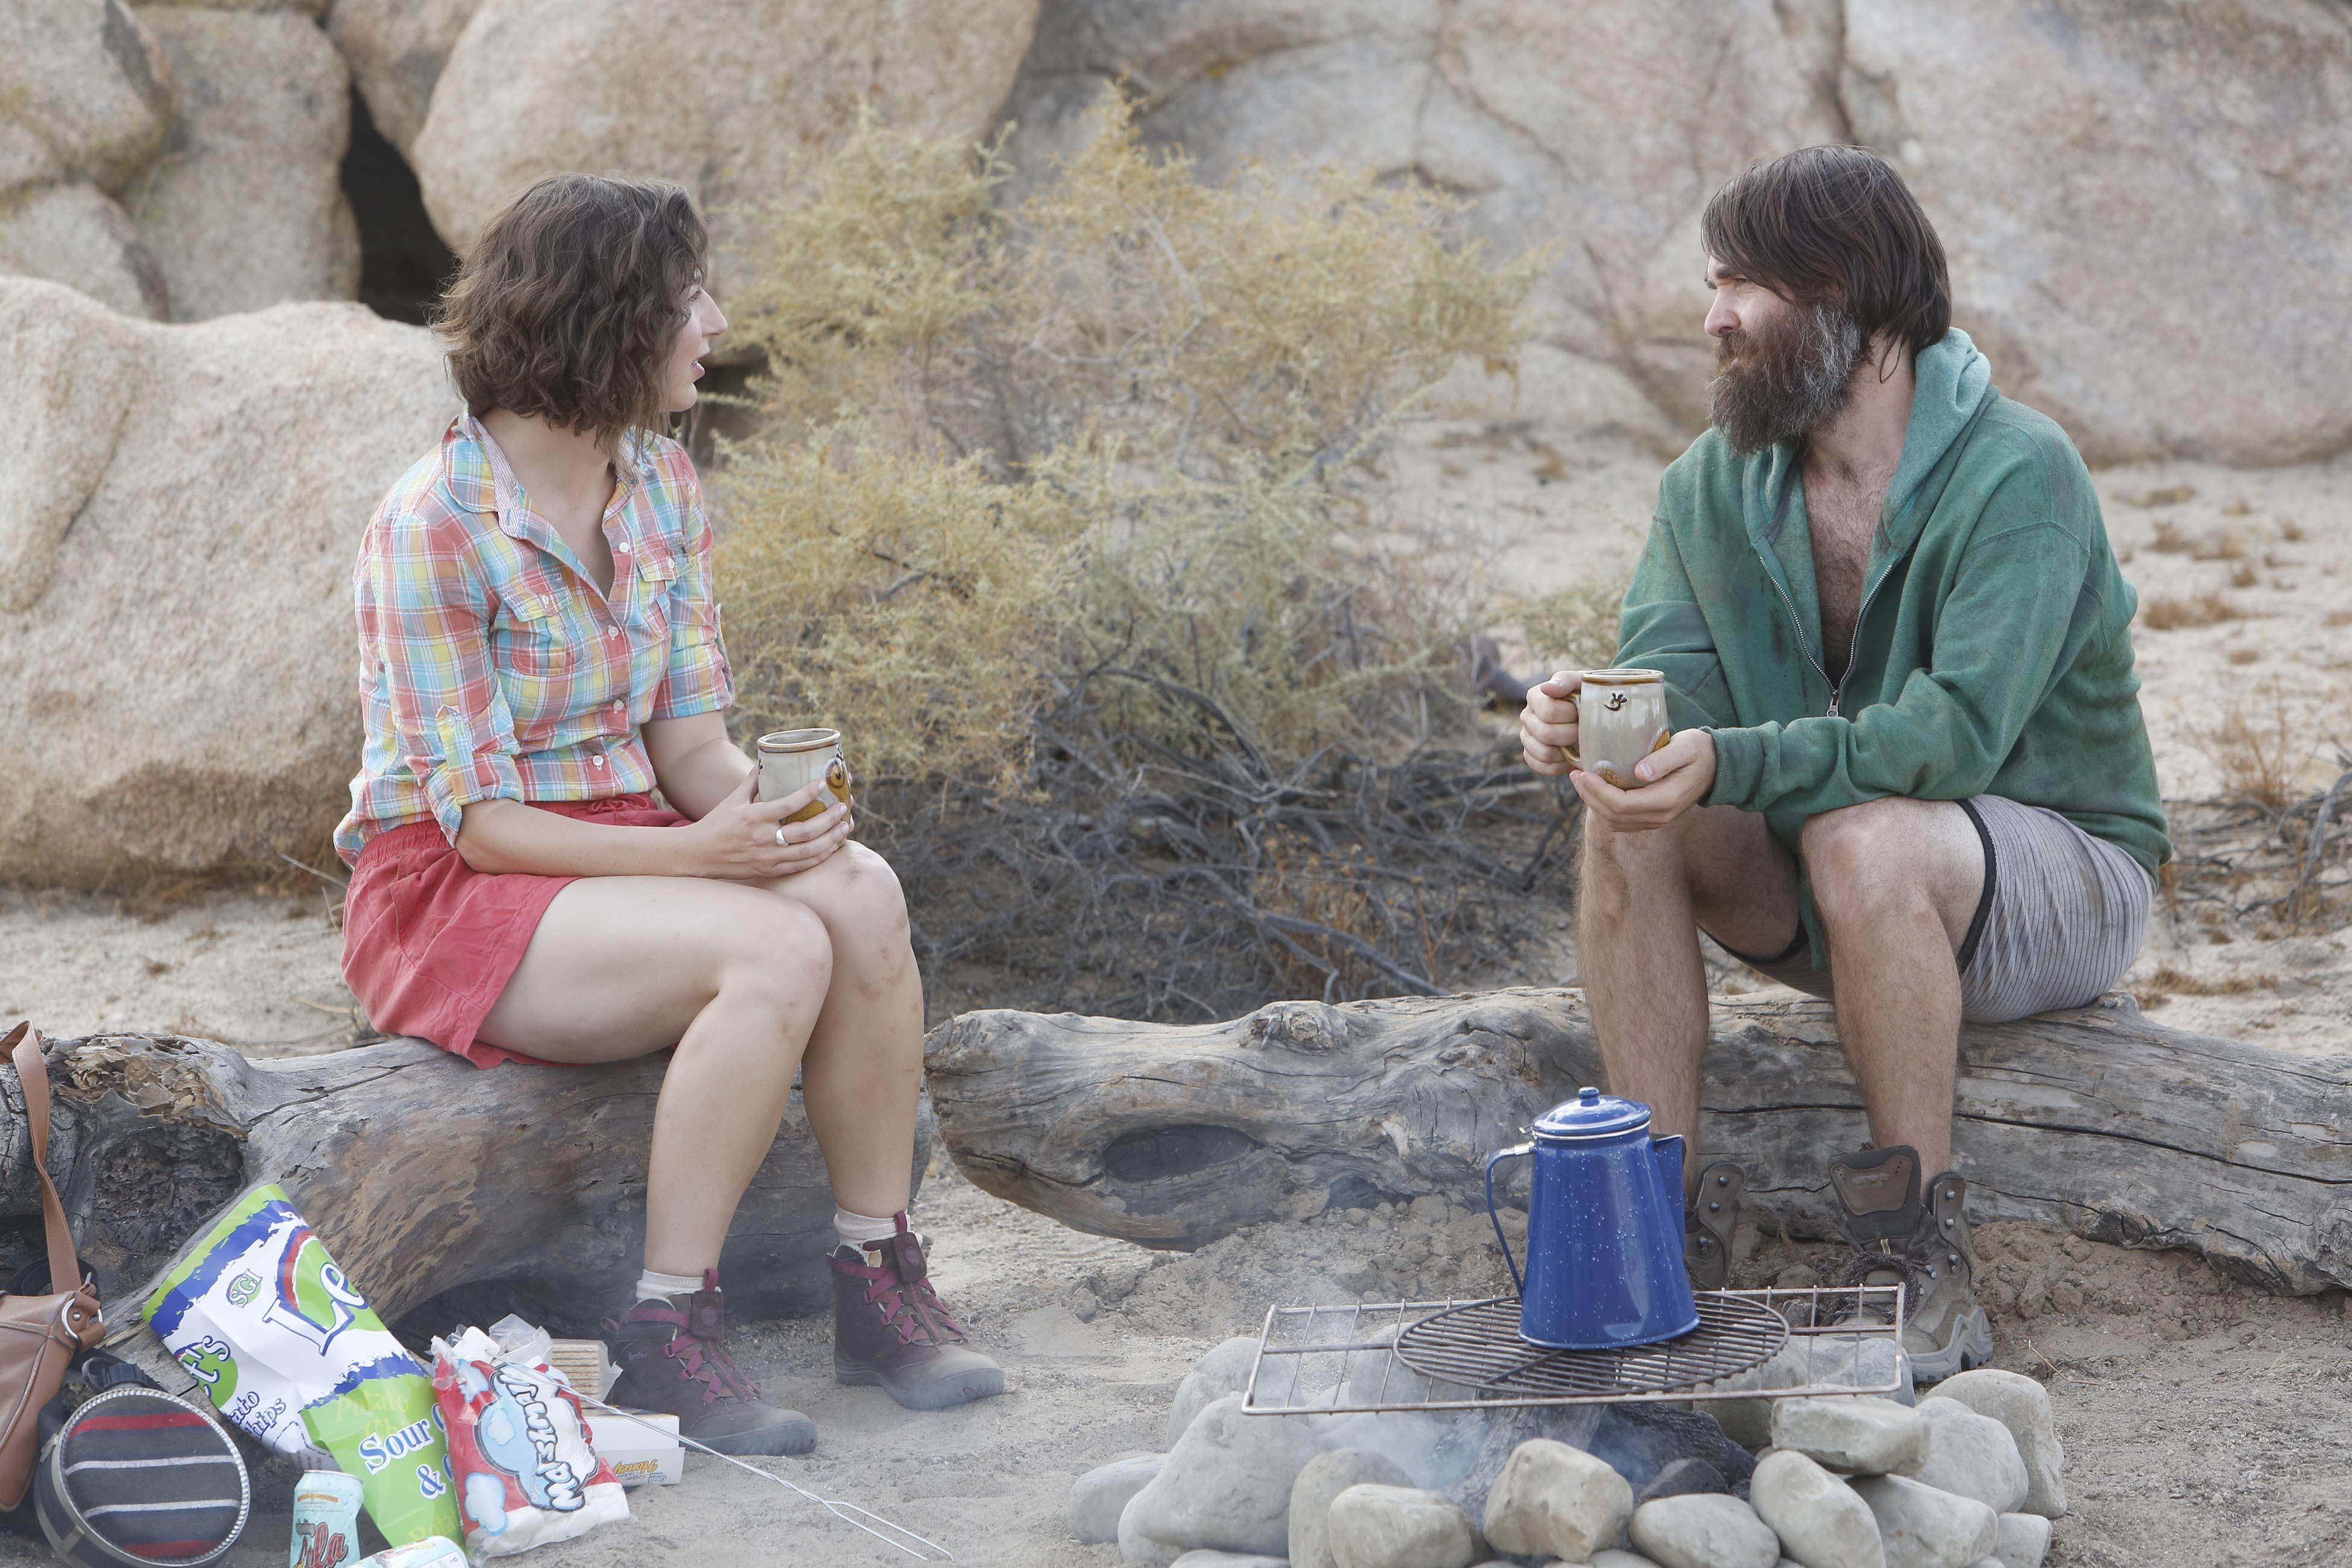 Phil Miller,Will Forte, meets Carol Pilbasian, Kristen Schaal, in  The Last Man on Earth.